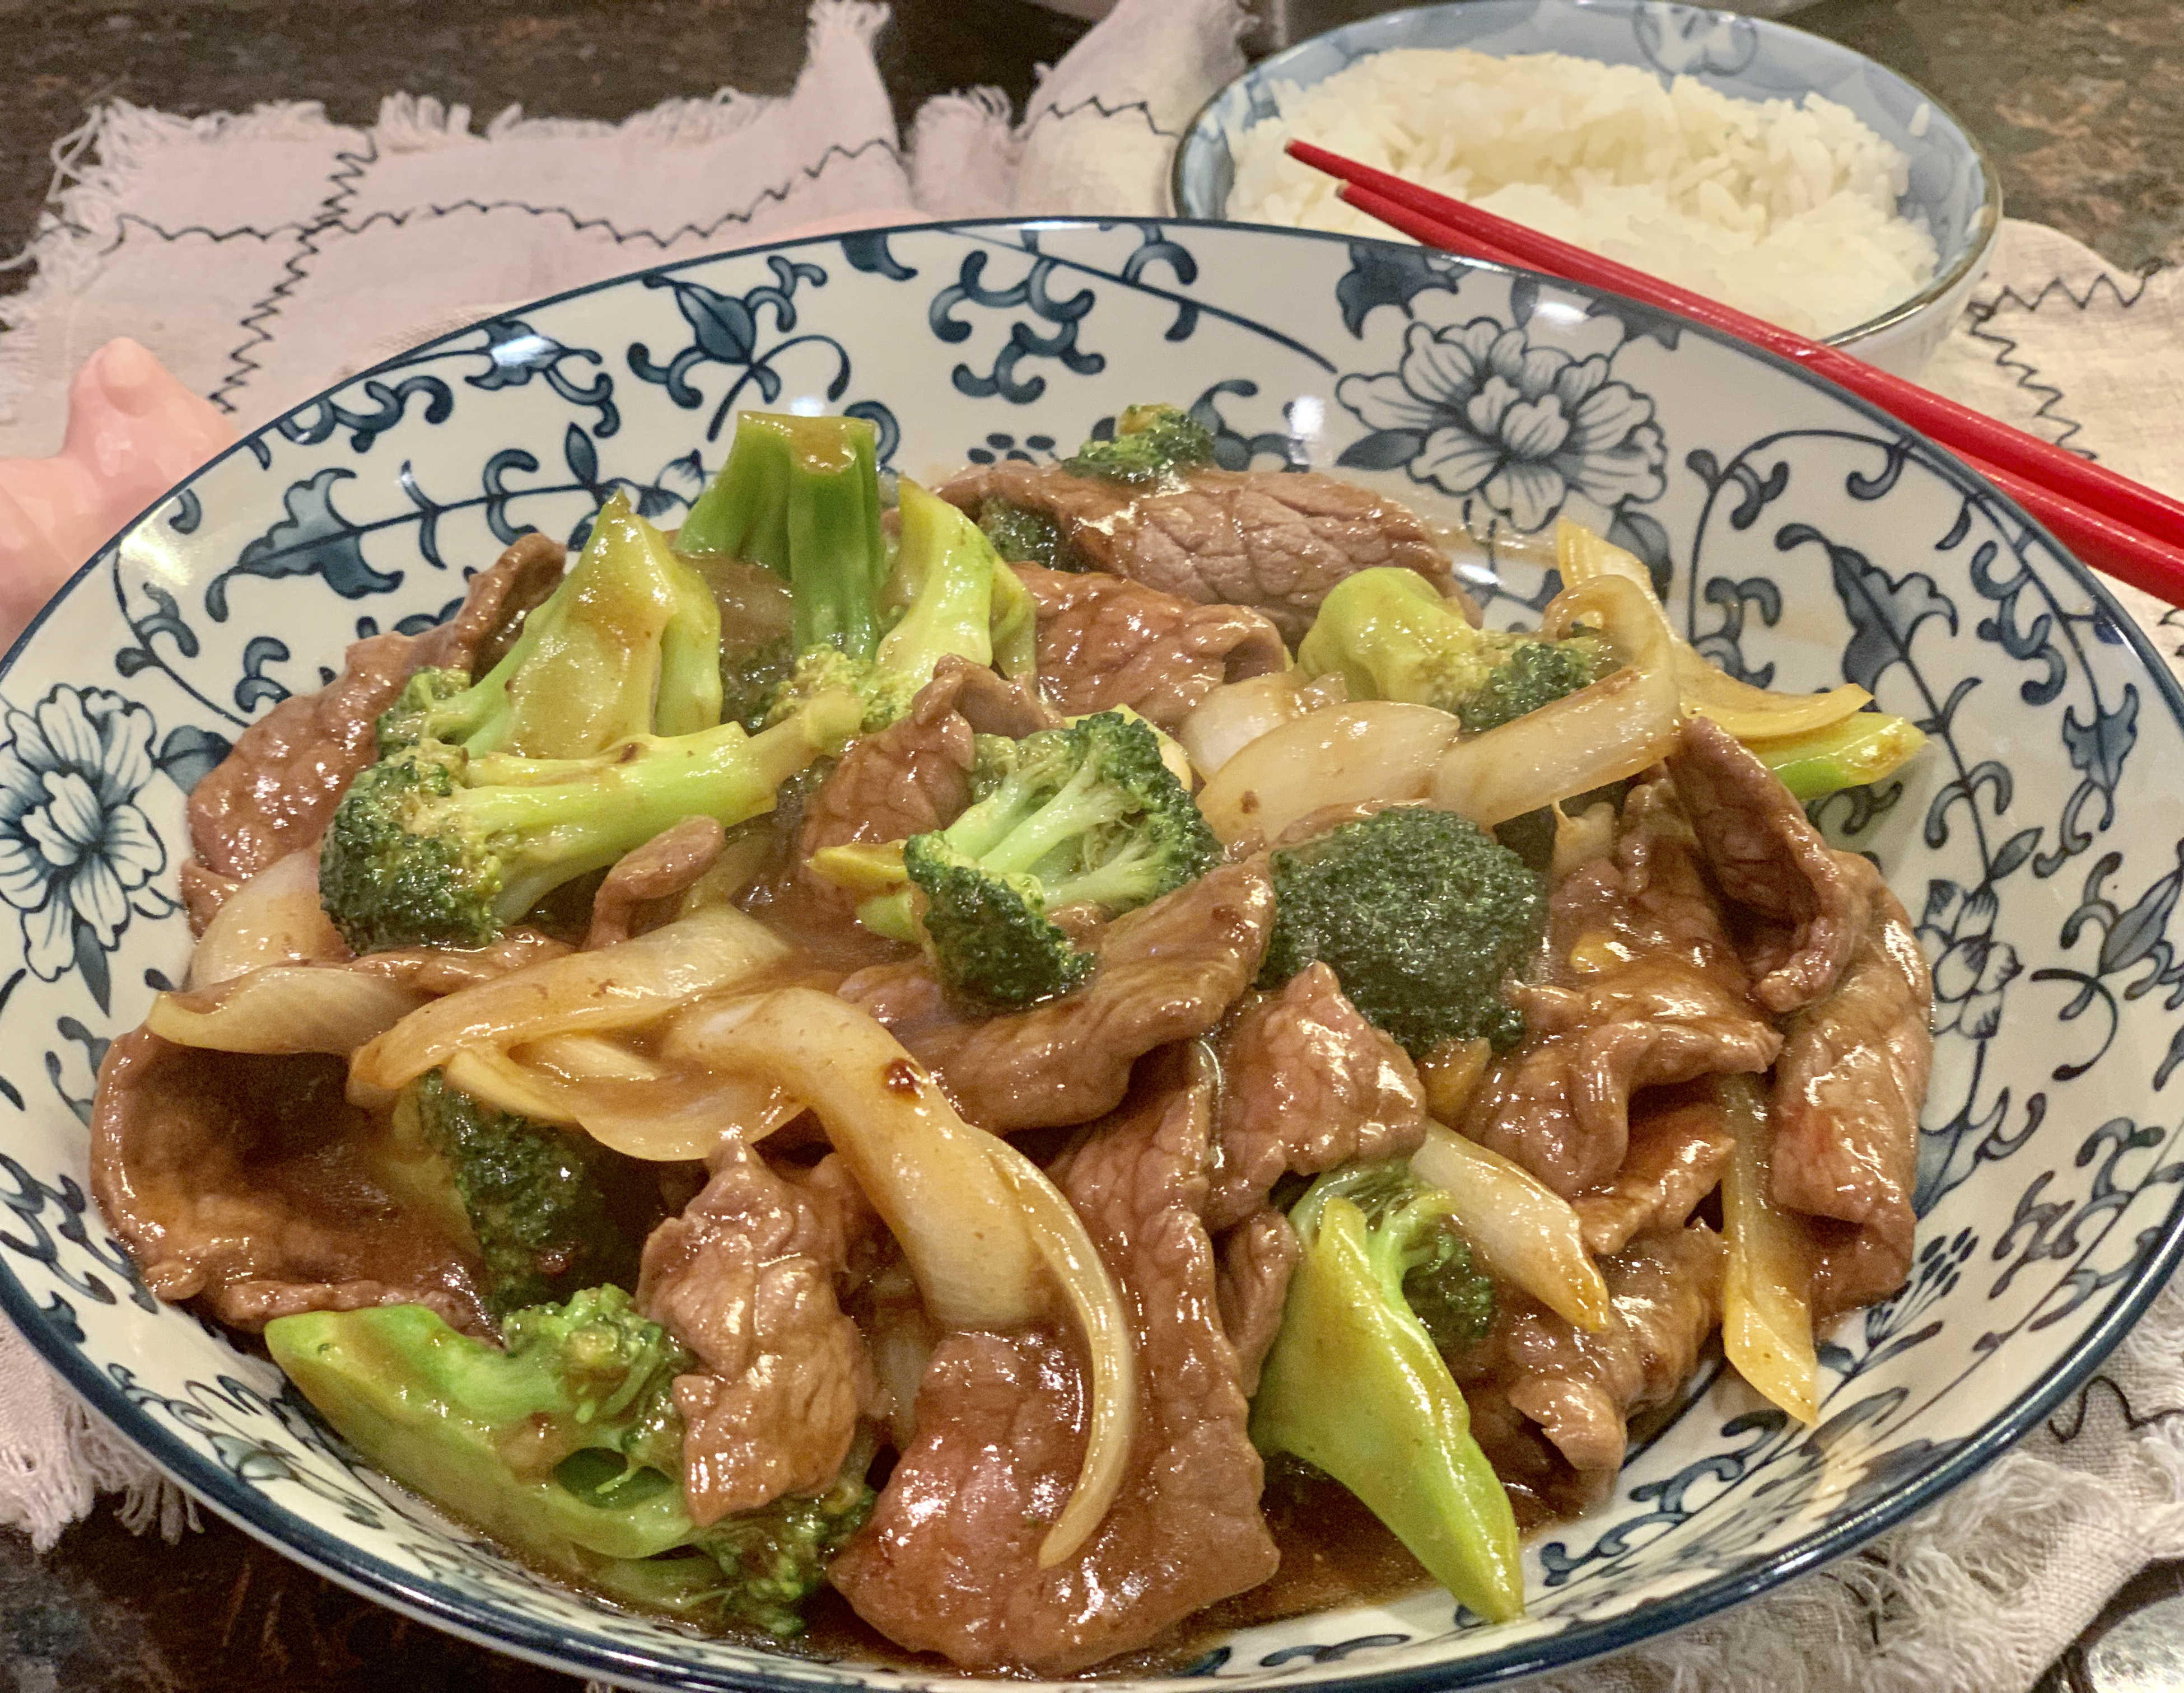 Beef Broccoli Stir-fry西兰花炒牛肉xī lán huā chǎo niú ròu